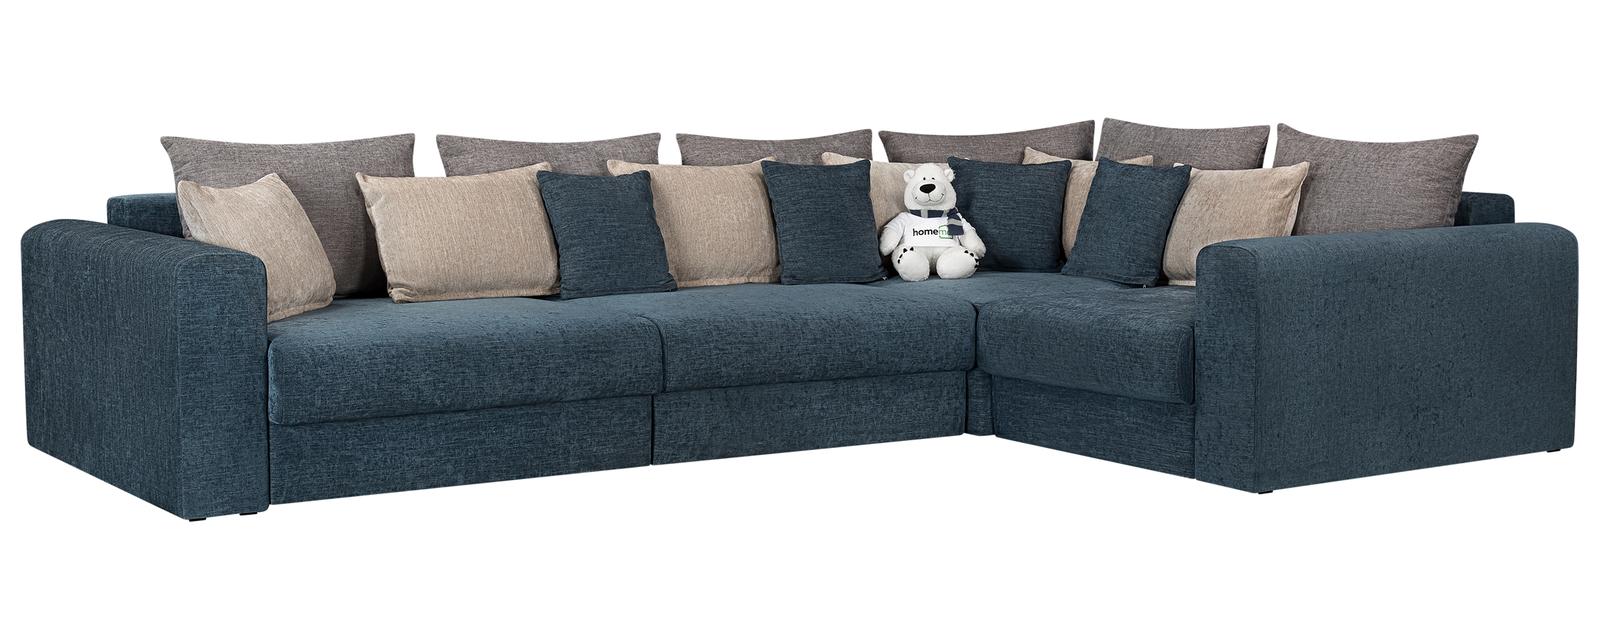 Модульный диван Медисон Вариант №2 Anabelle синий (Шенилл)